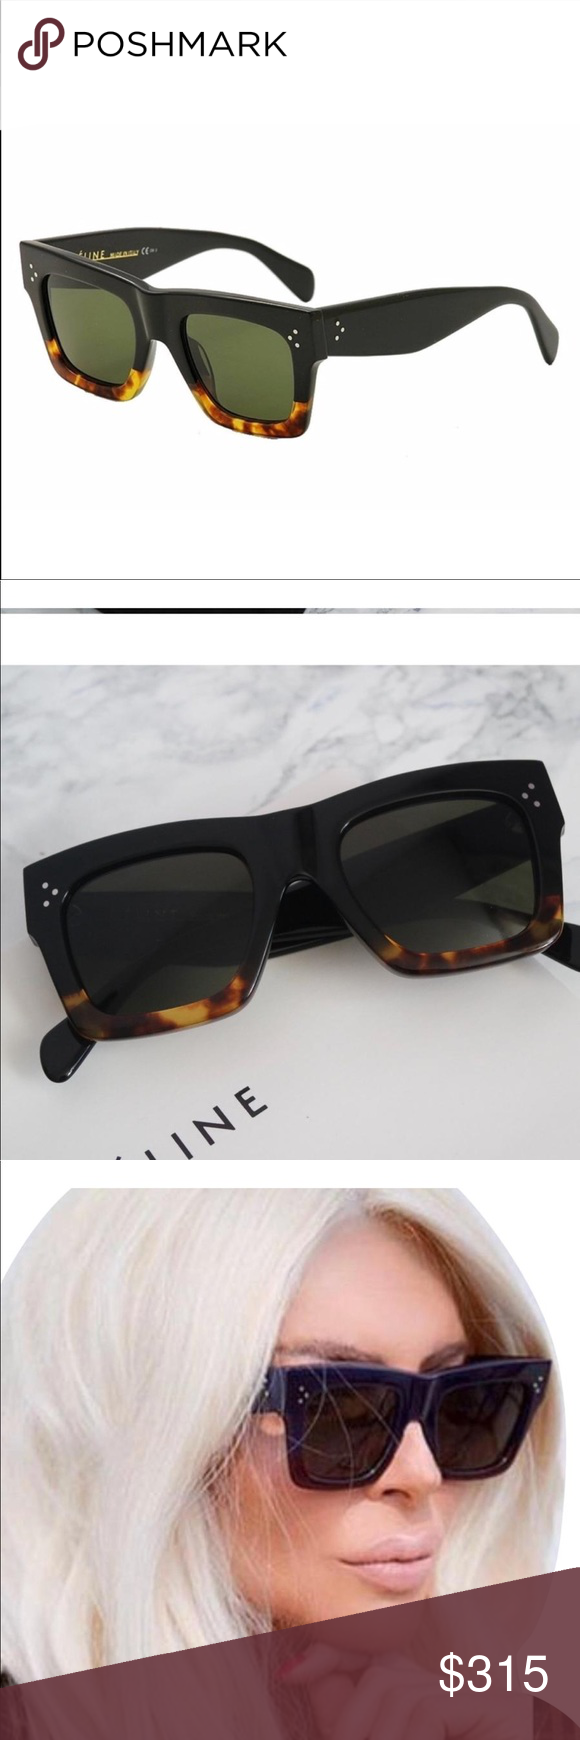 f23c67af42b6d Celine 41054 black Havana sunglasses Brand new Celine CL 41054 S Sunglasses.  Available